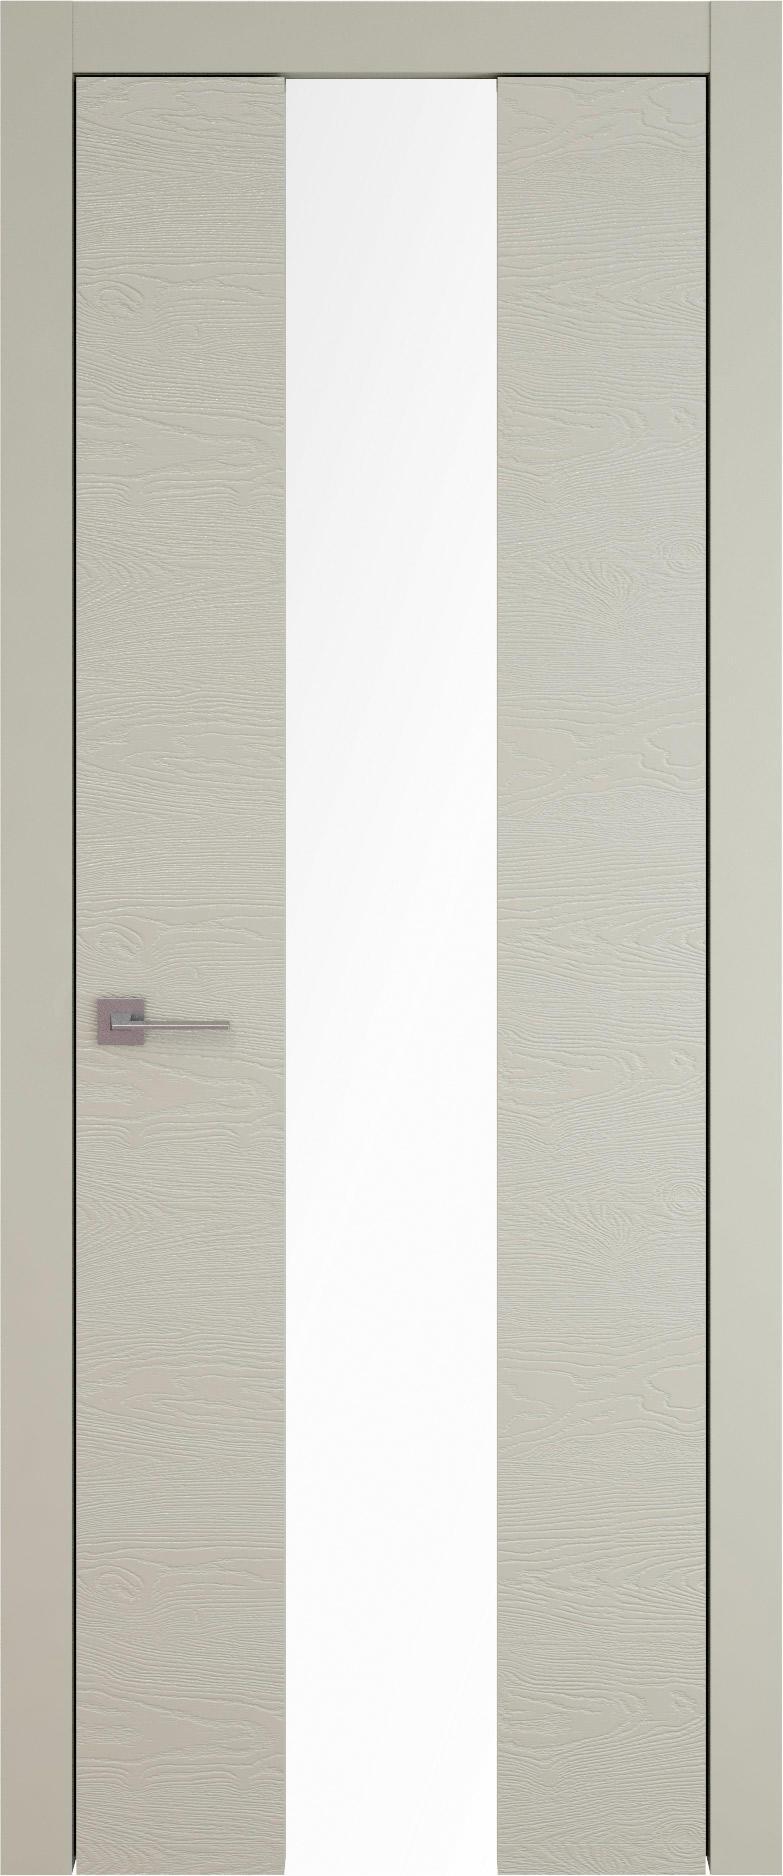 Tivoli Ж-5 цвет - Серо-оливковая эмаль по шпону (RAL 7032) Со стеклом (ДО)